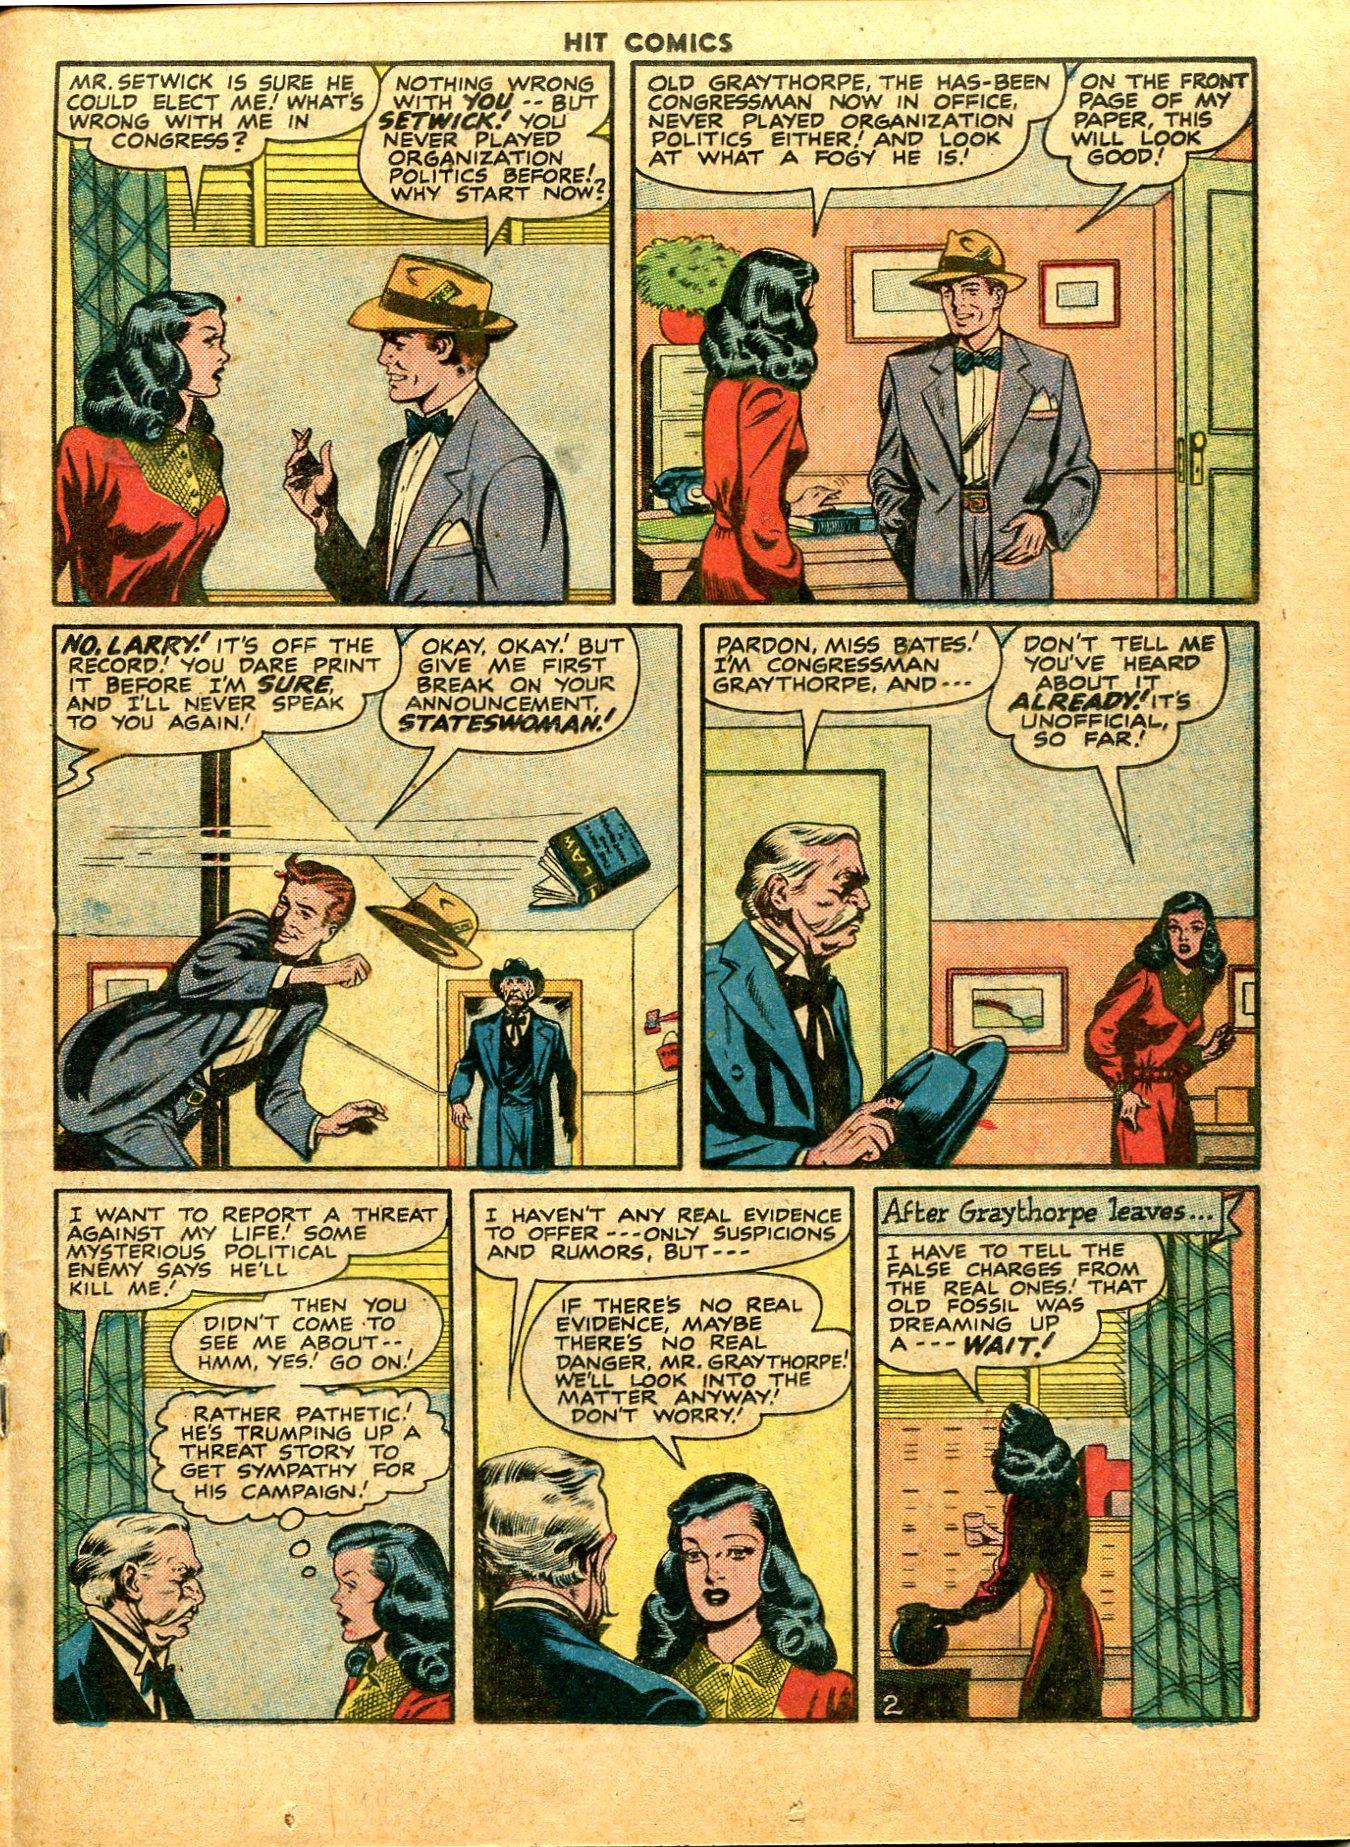 Read online Hit Comics comic -  Issue #49 - 27